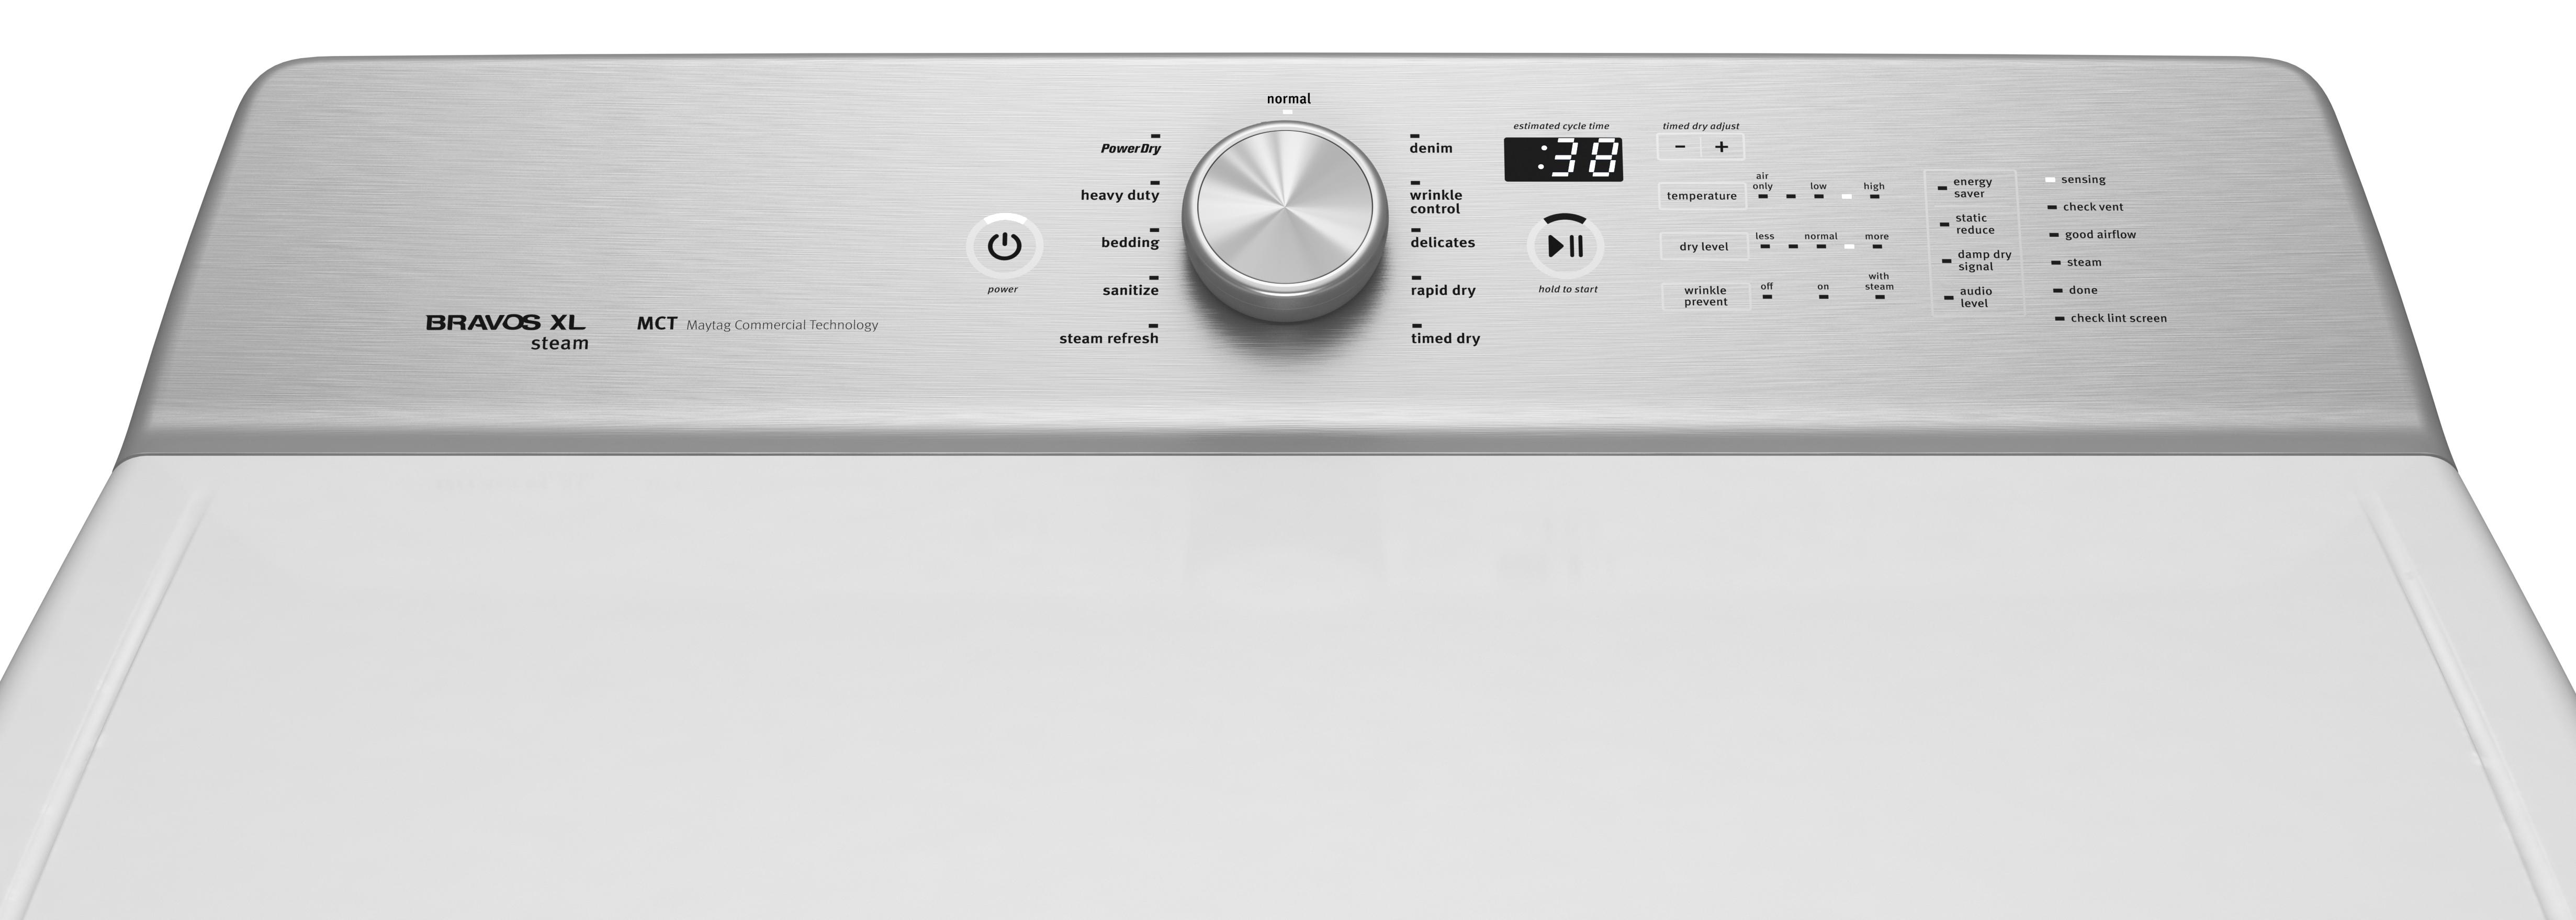 Maytag MEDB855DW 8.8 cu. ft. High Capacity Electric Dryer - White